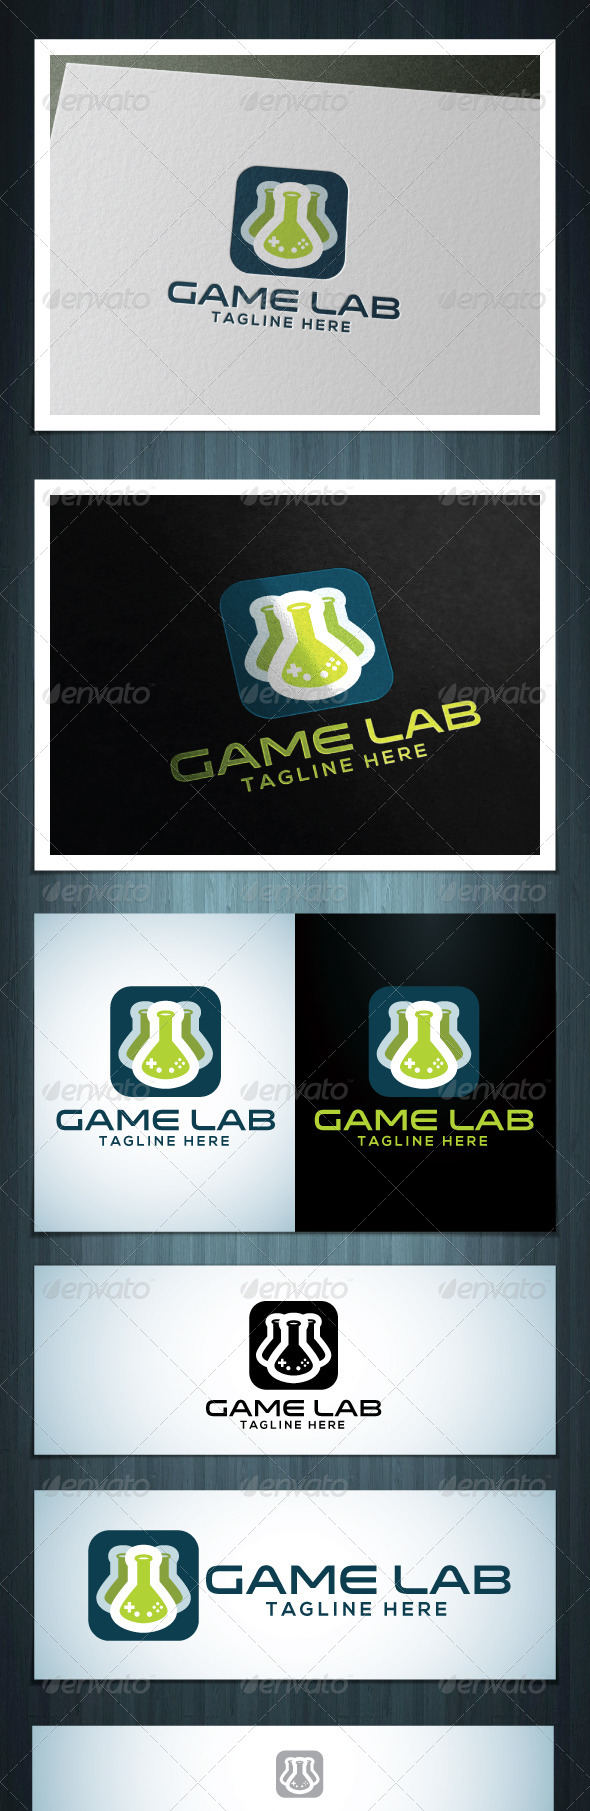 GraphicRiver Game Lab 7591893